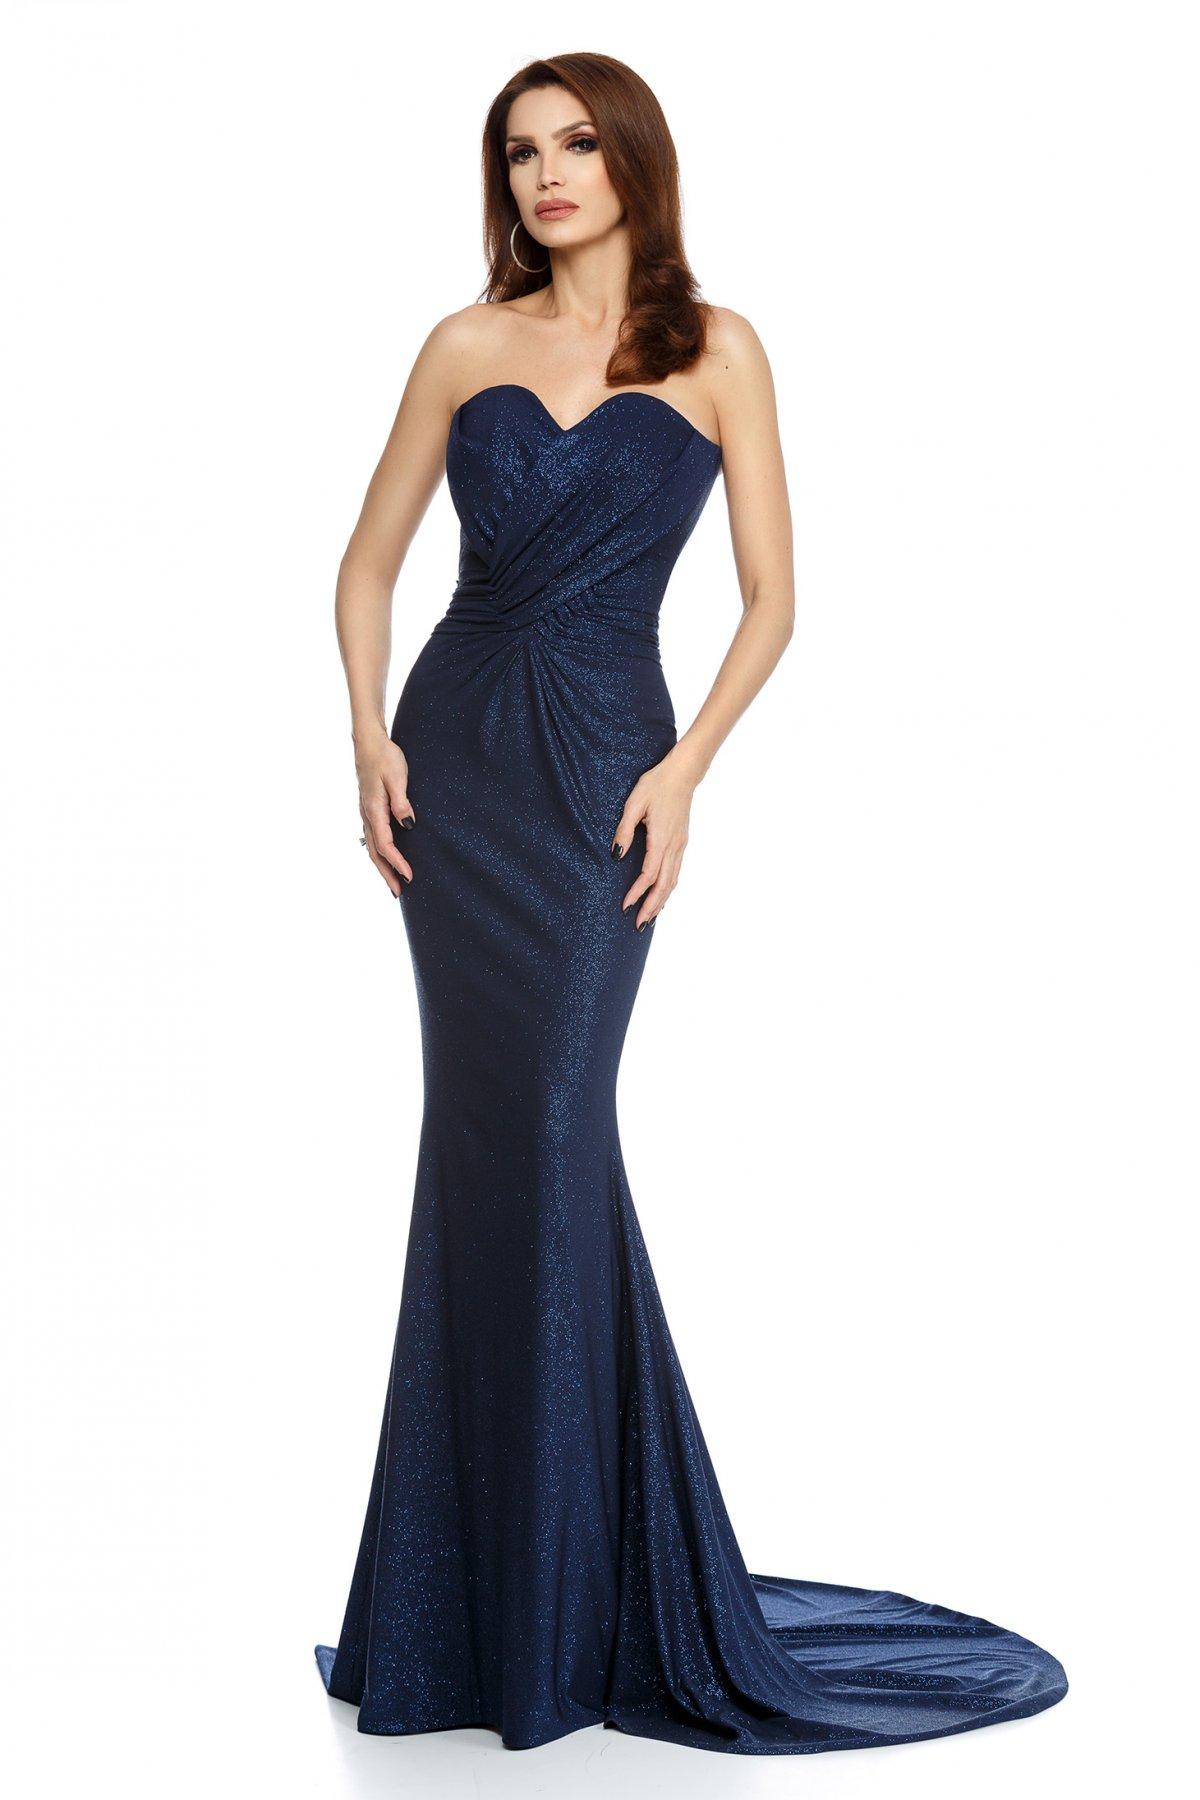 Rochie albastru-inchis lunga tip sirena din lurex fara maneci